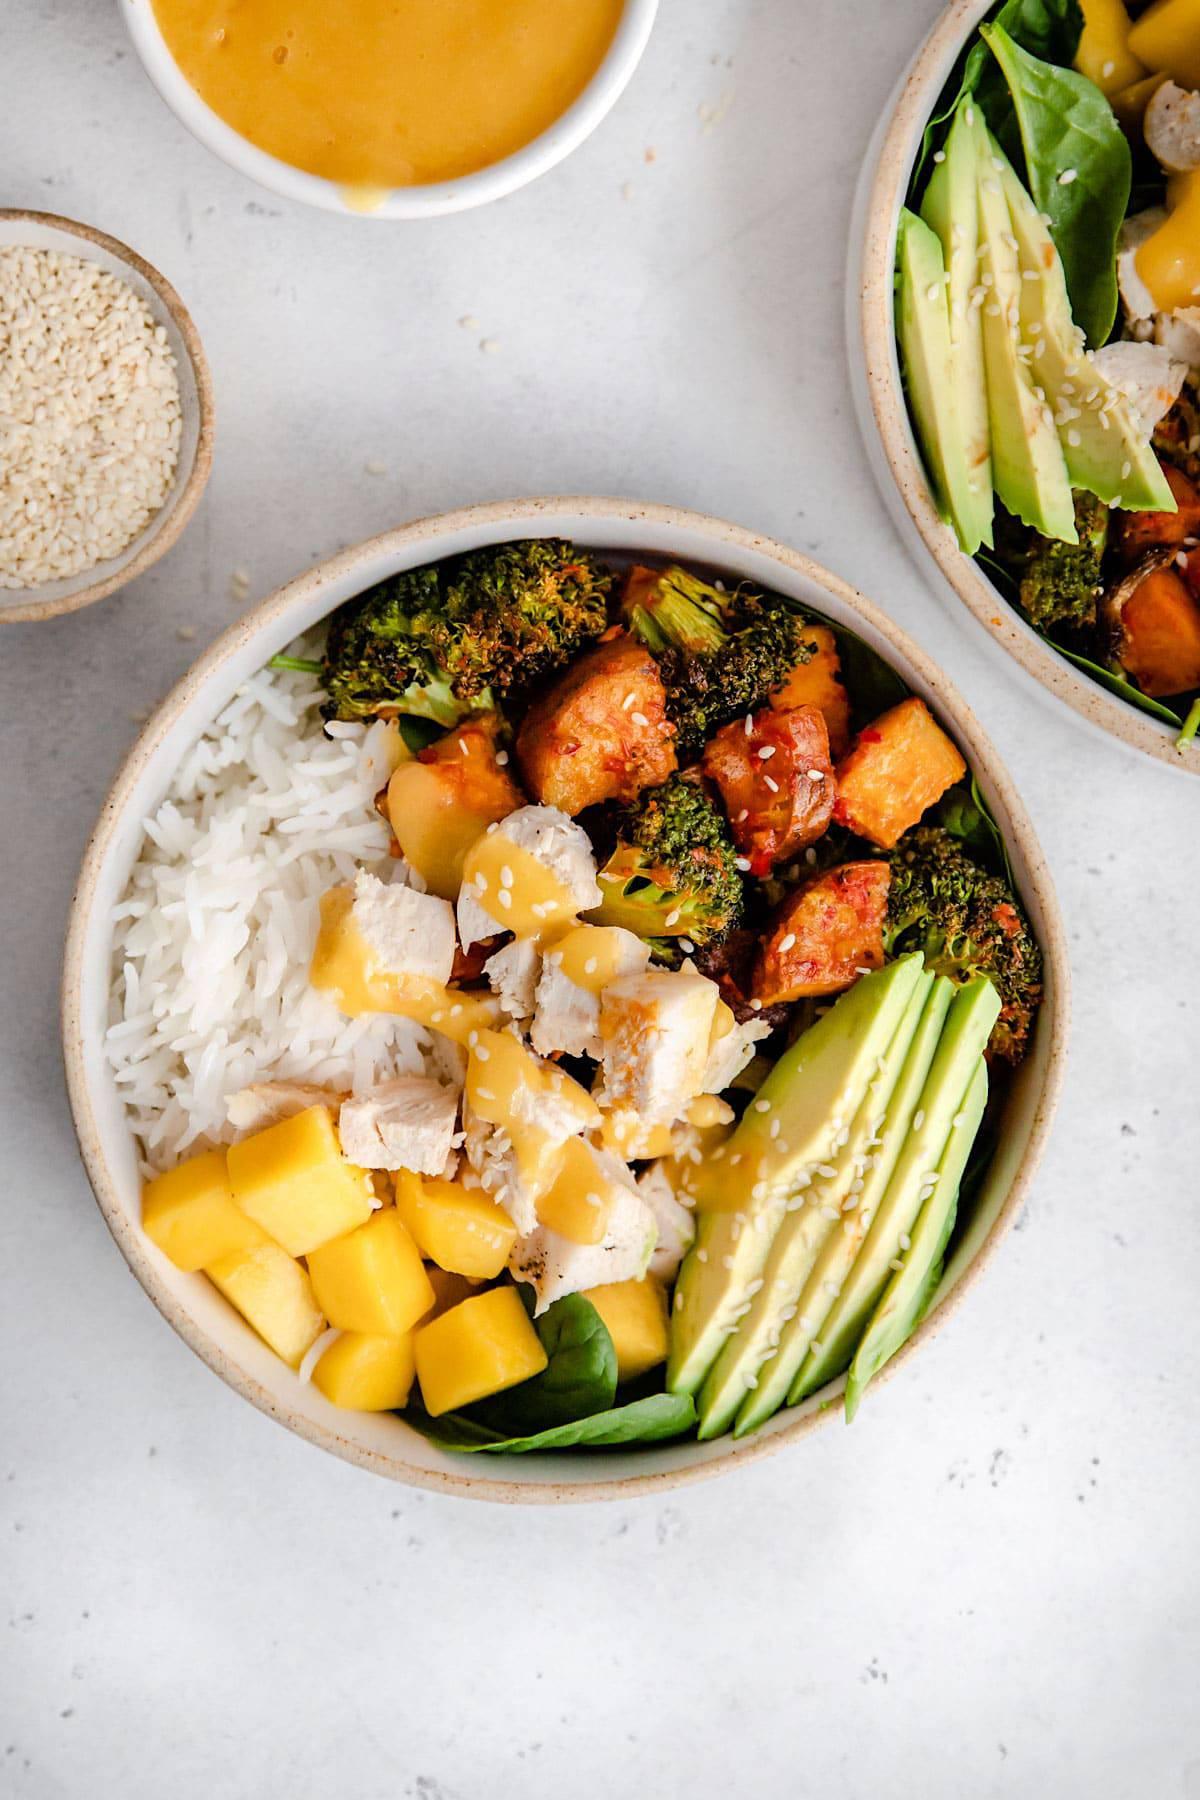 A buddha bowl with chicken, avocado, mango and sweet potato.